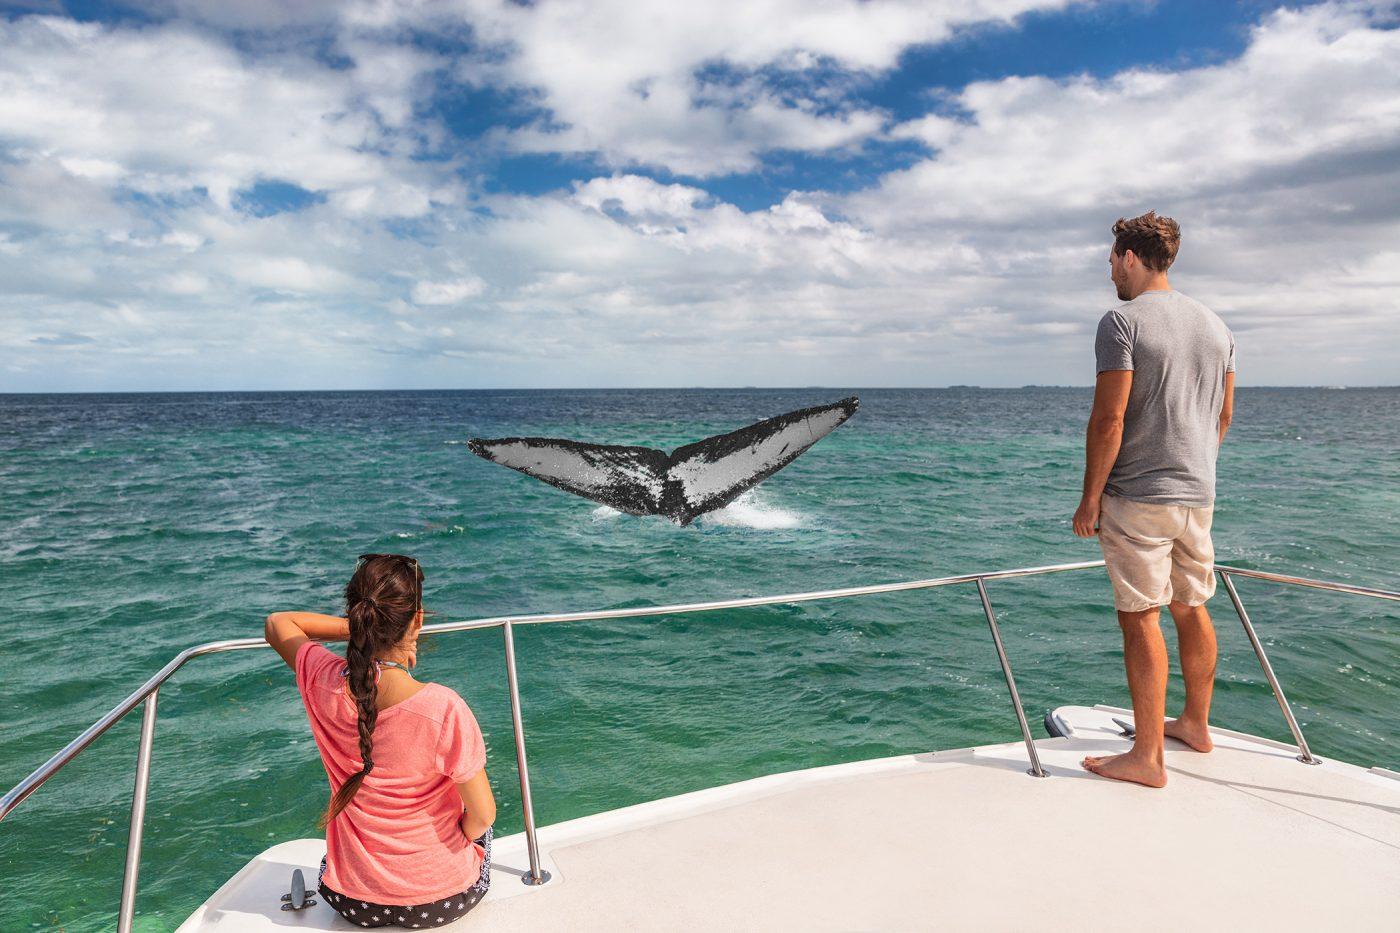 1-avistamiento-ballenas-whale-whatching-samana-barco-excursion-tour-boat-dominican-republic-republica-dominicana